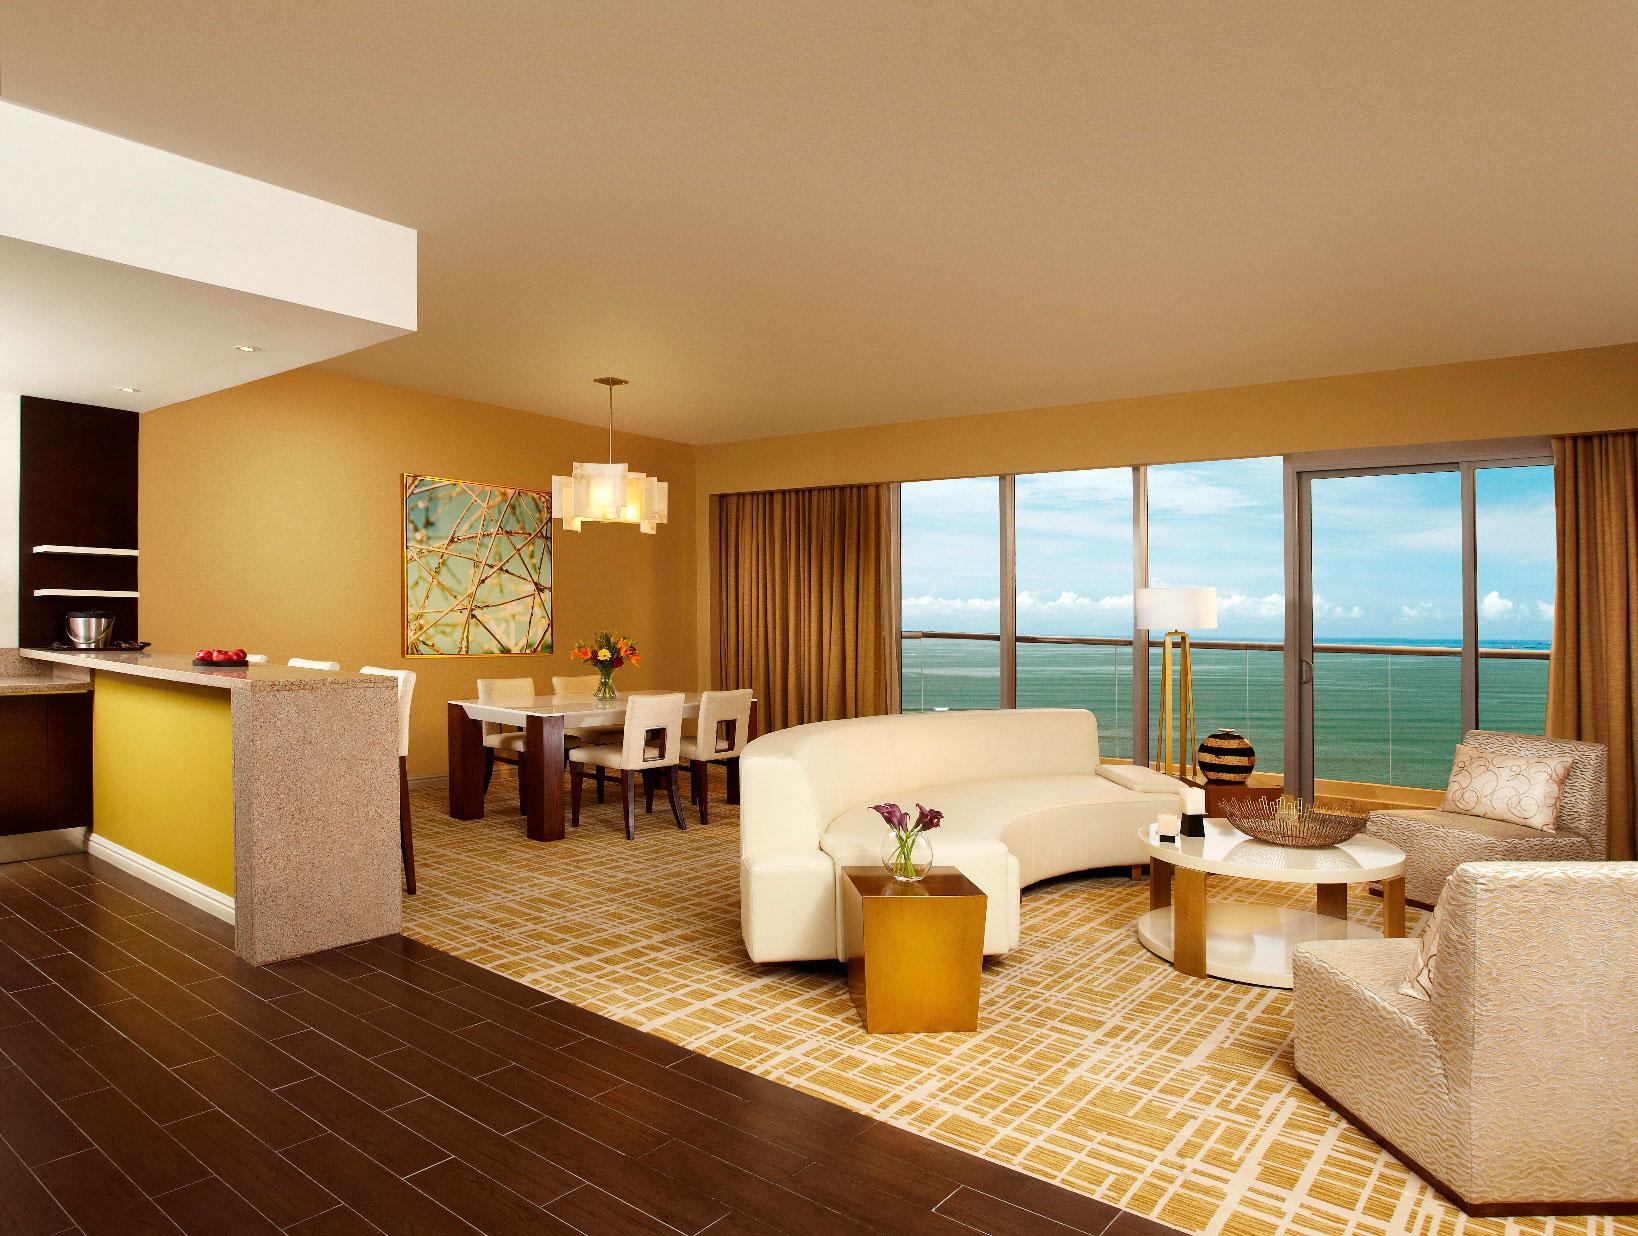 Waldorf Astoria By Hilton Hospitality Net